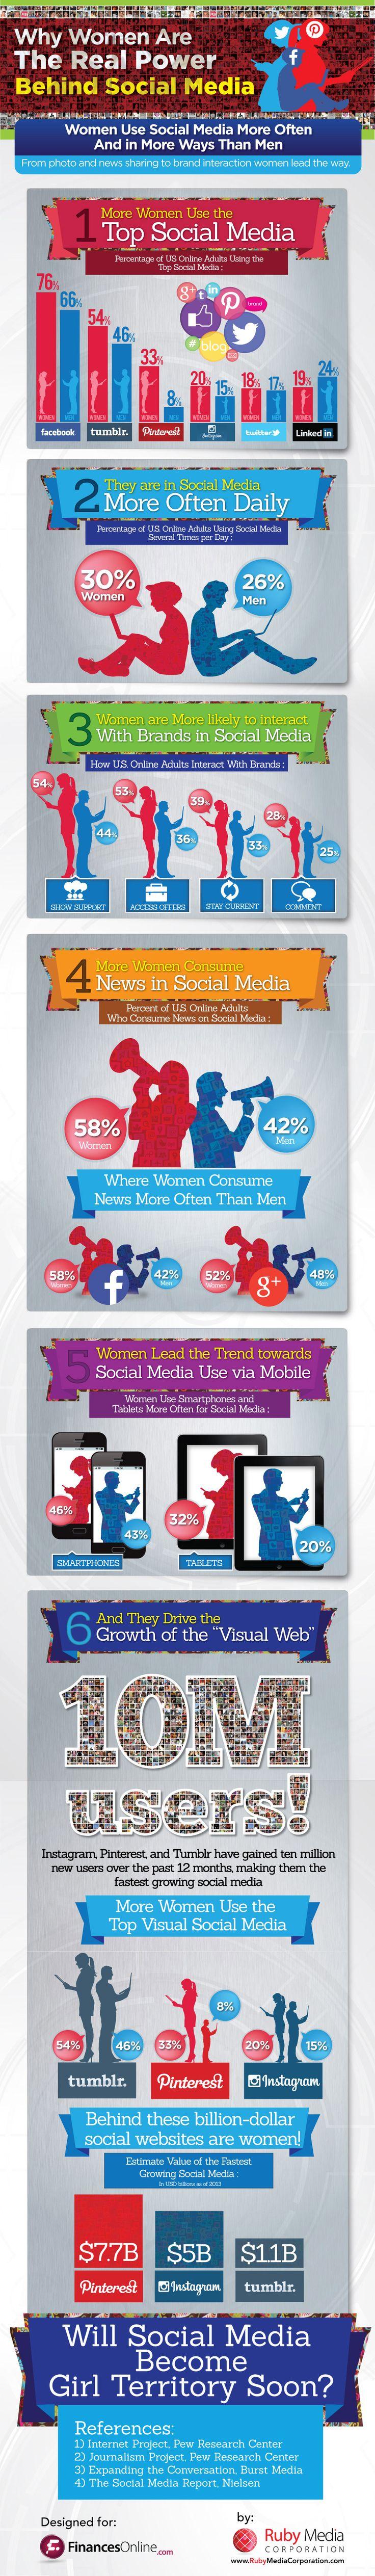 Women Dominate Every Social Media Network -- Except One (Infographic)   Entrepreneur.com